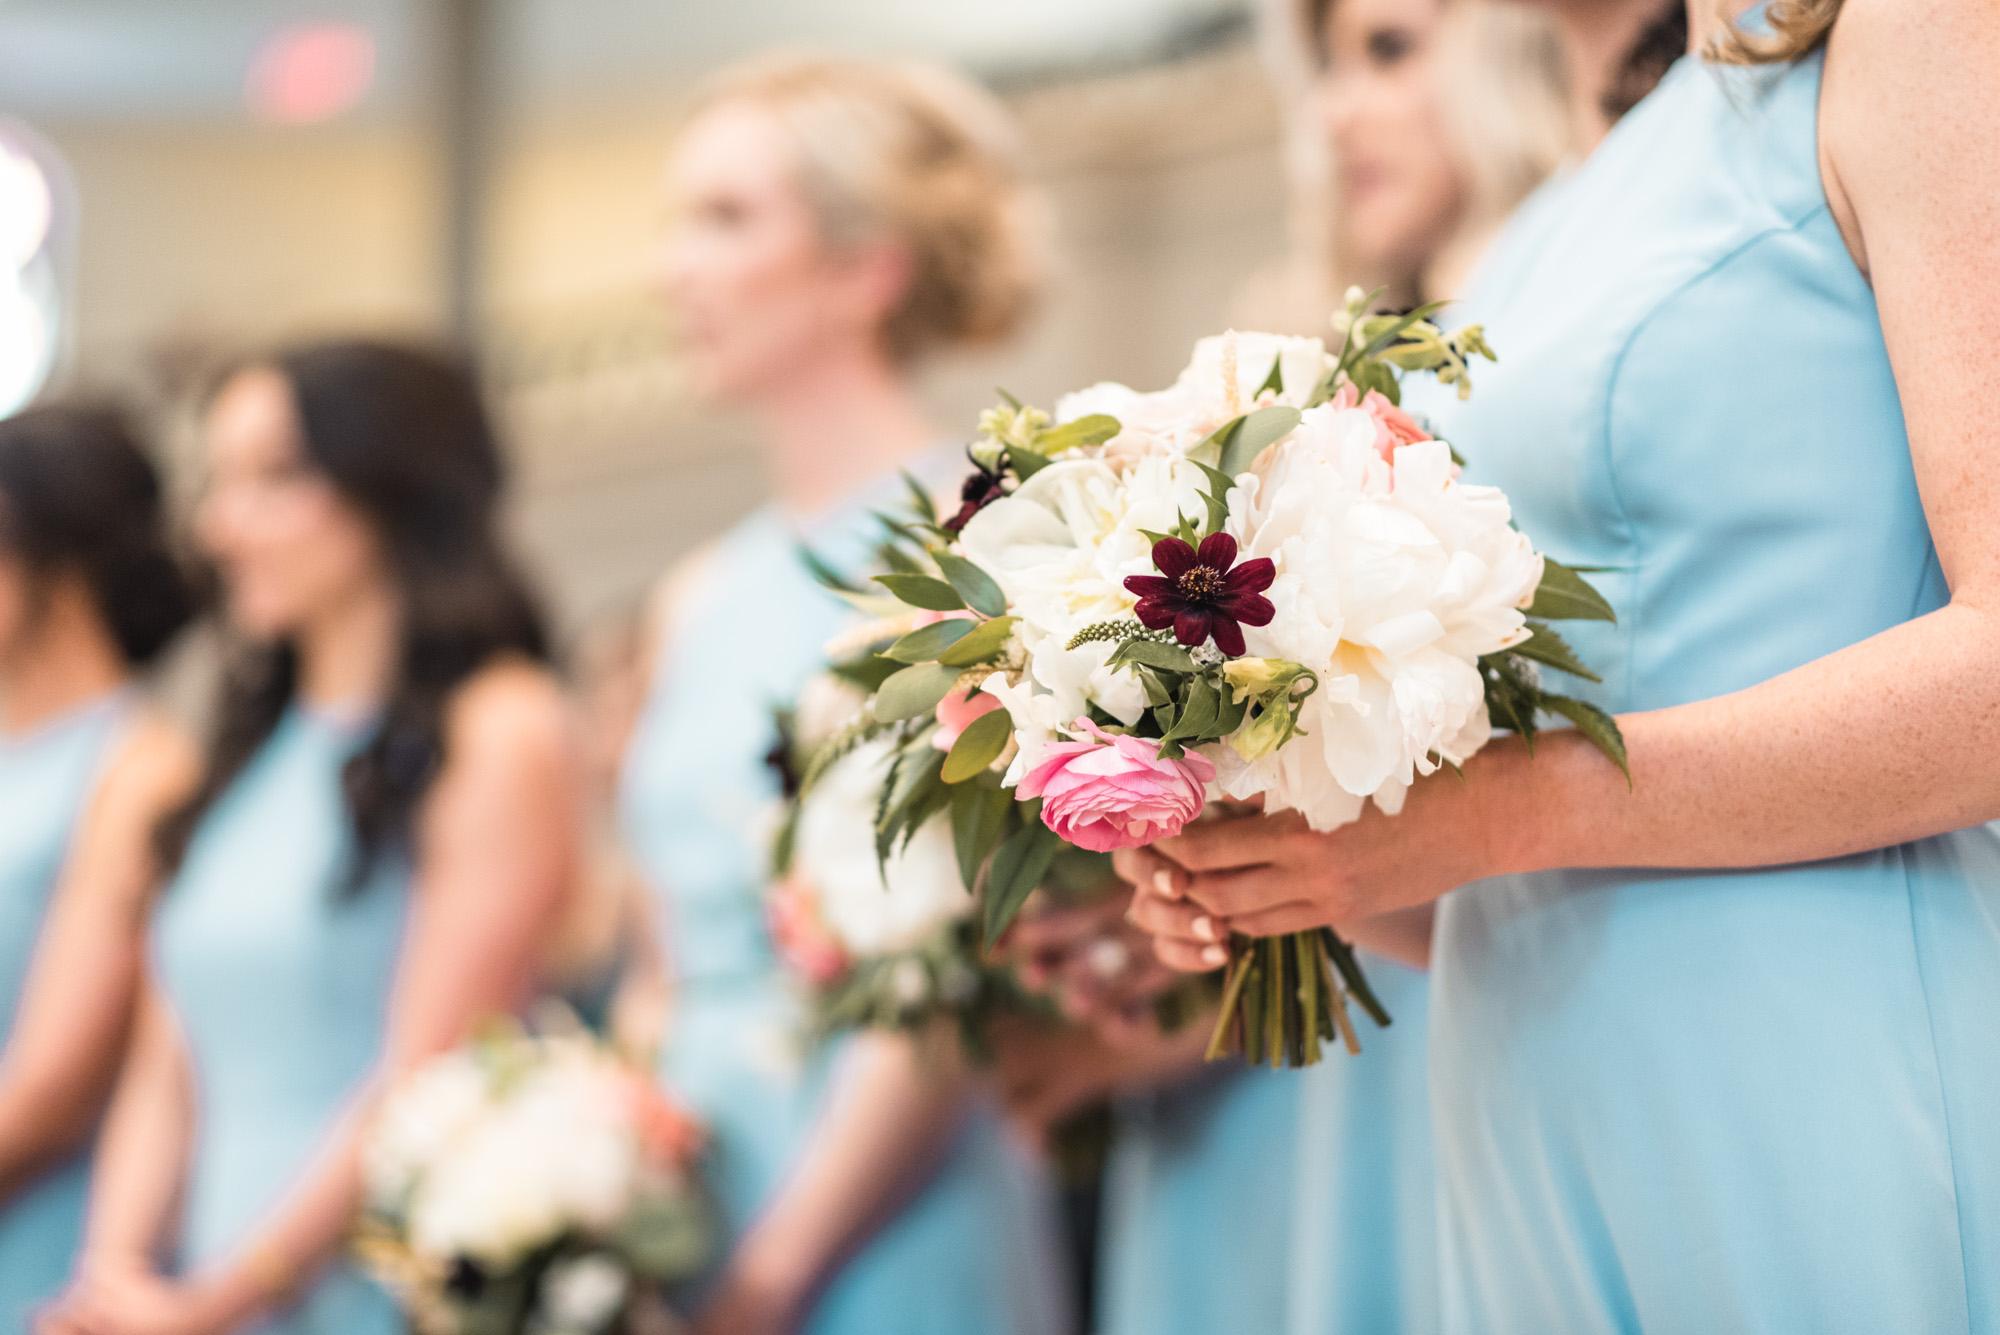 Bridesmaids bouquet at ceremony